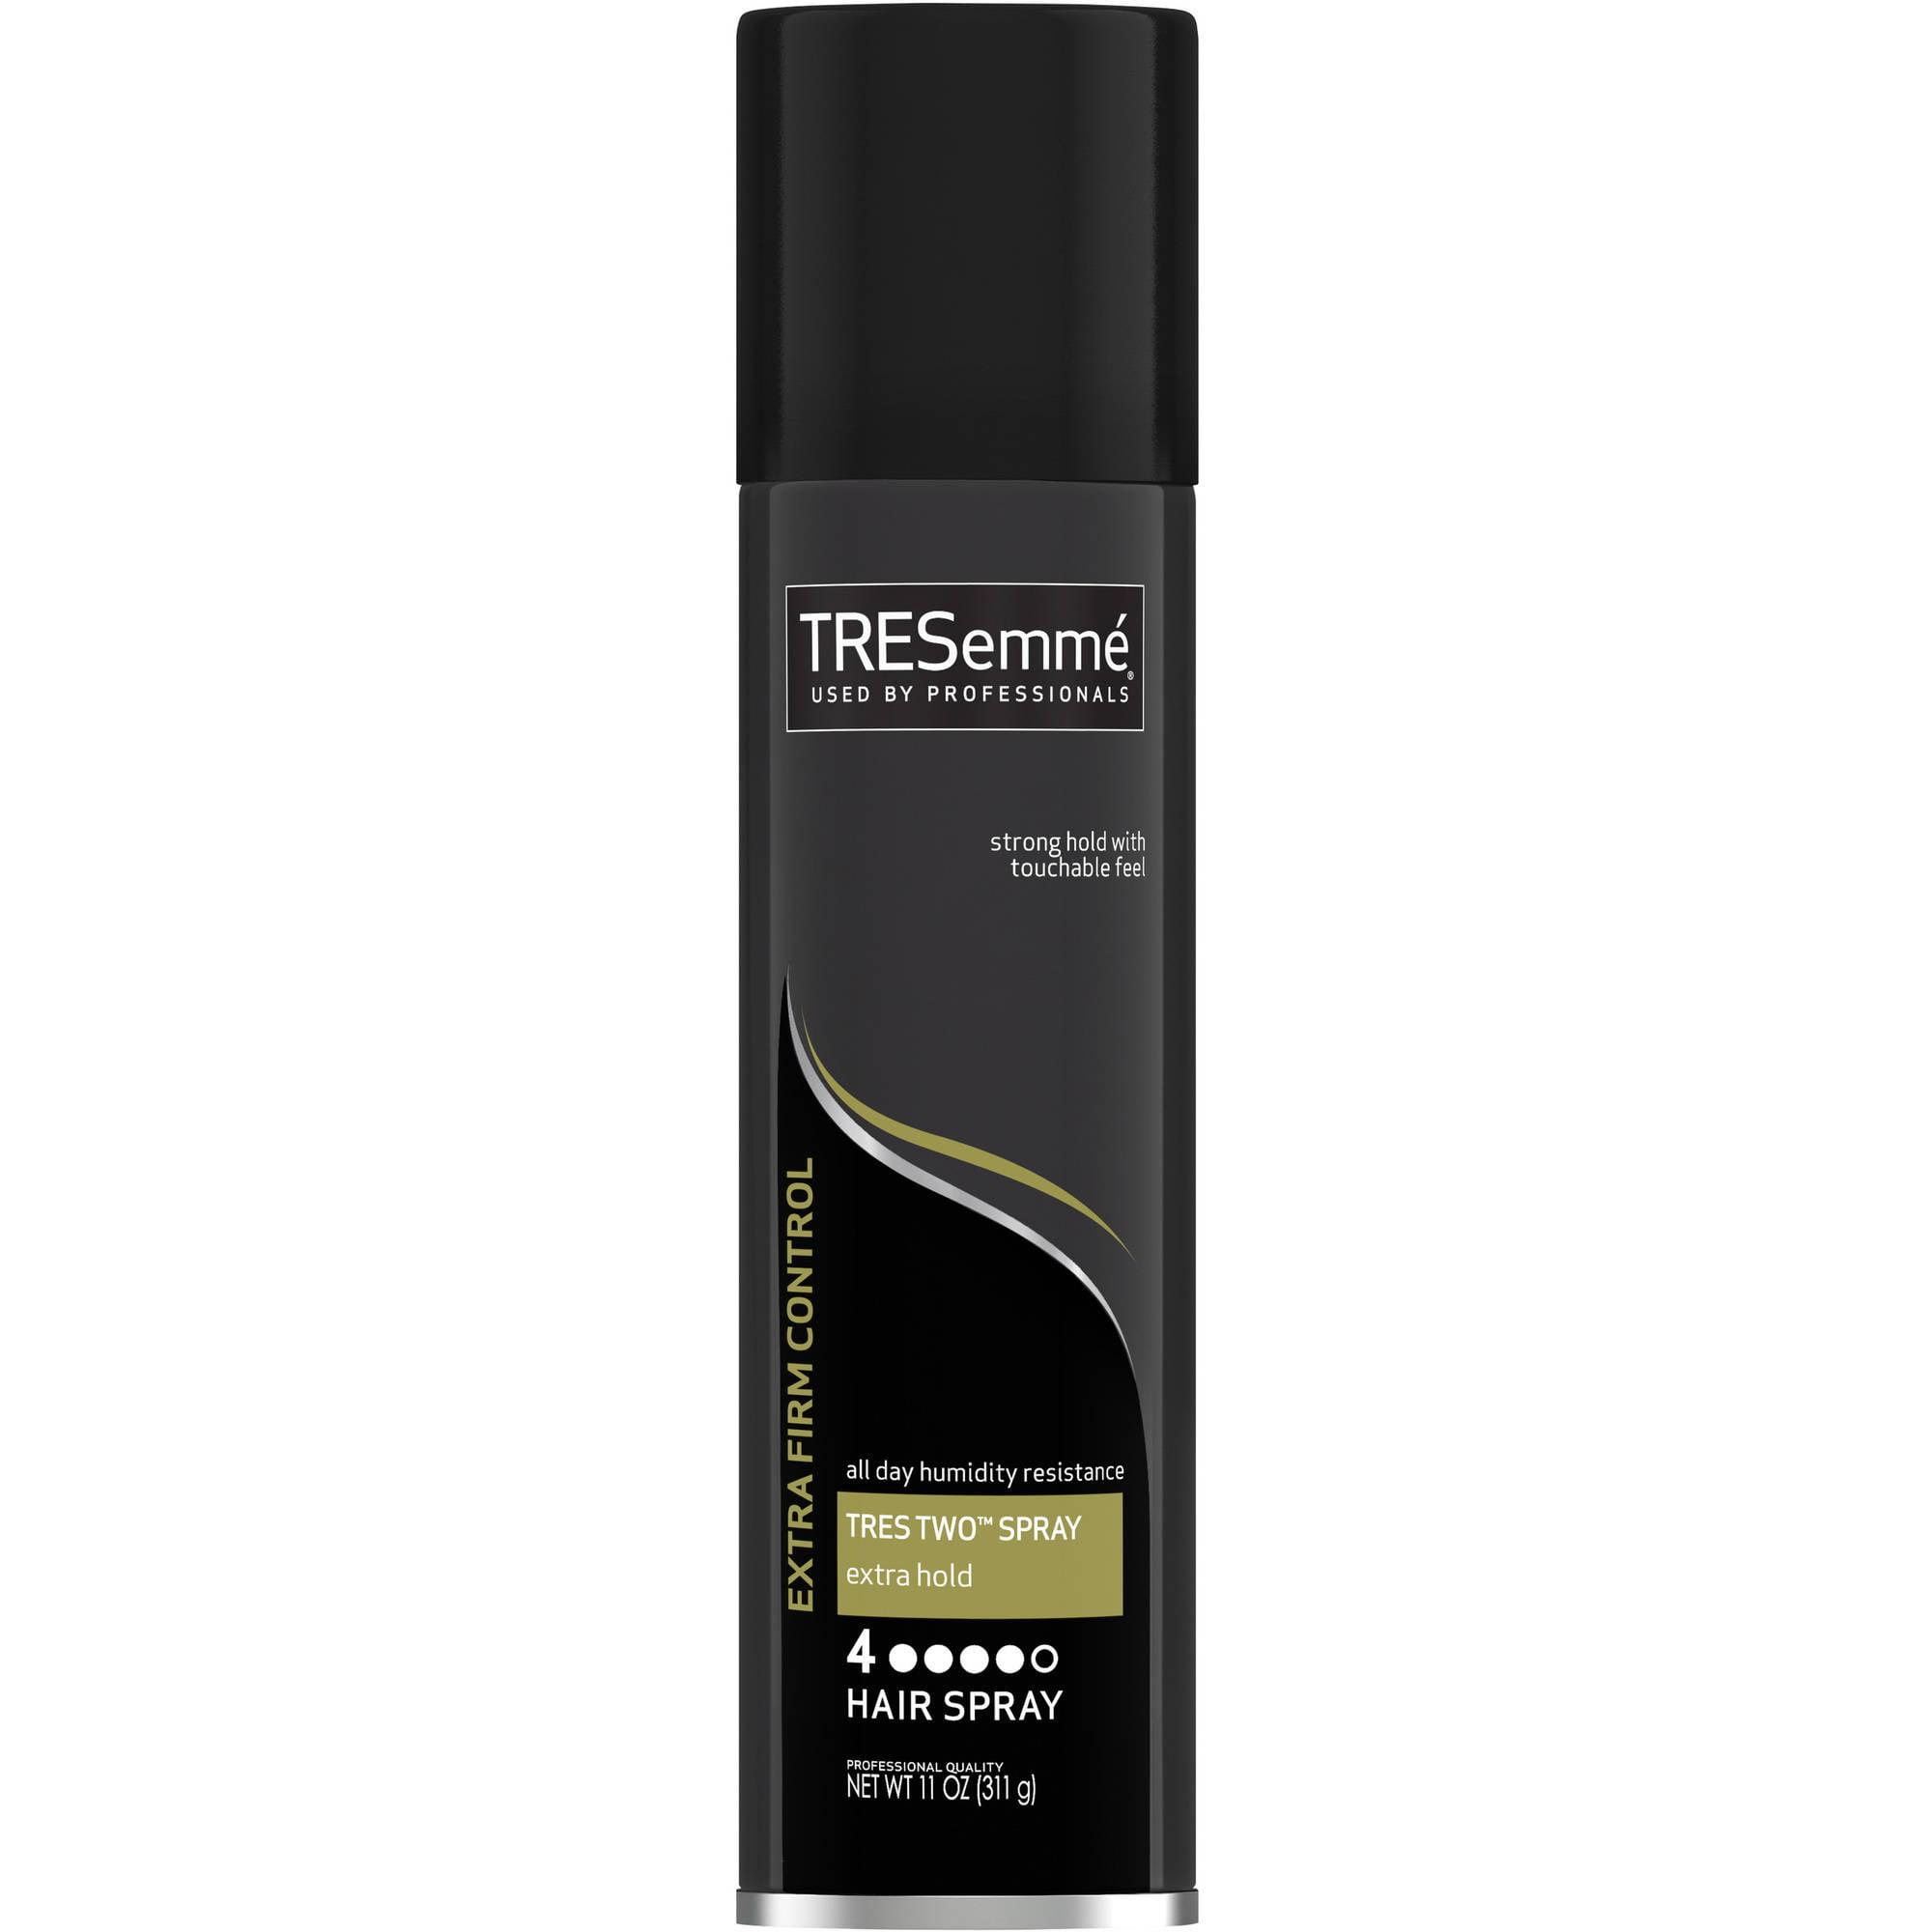 TRESemme TRES Two Extra Hold Aerosol Hairspray, 11 fl oz